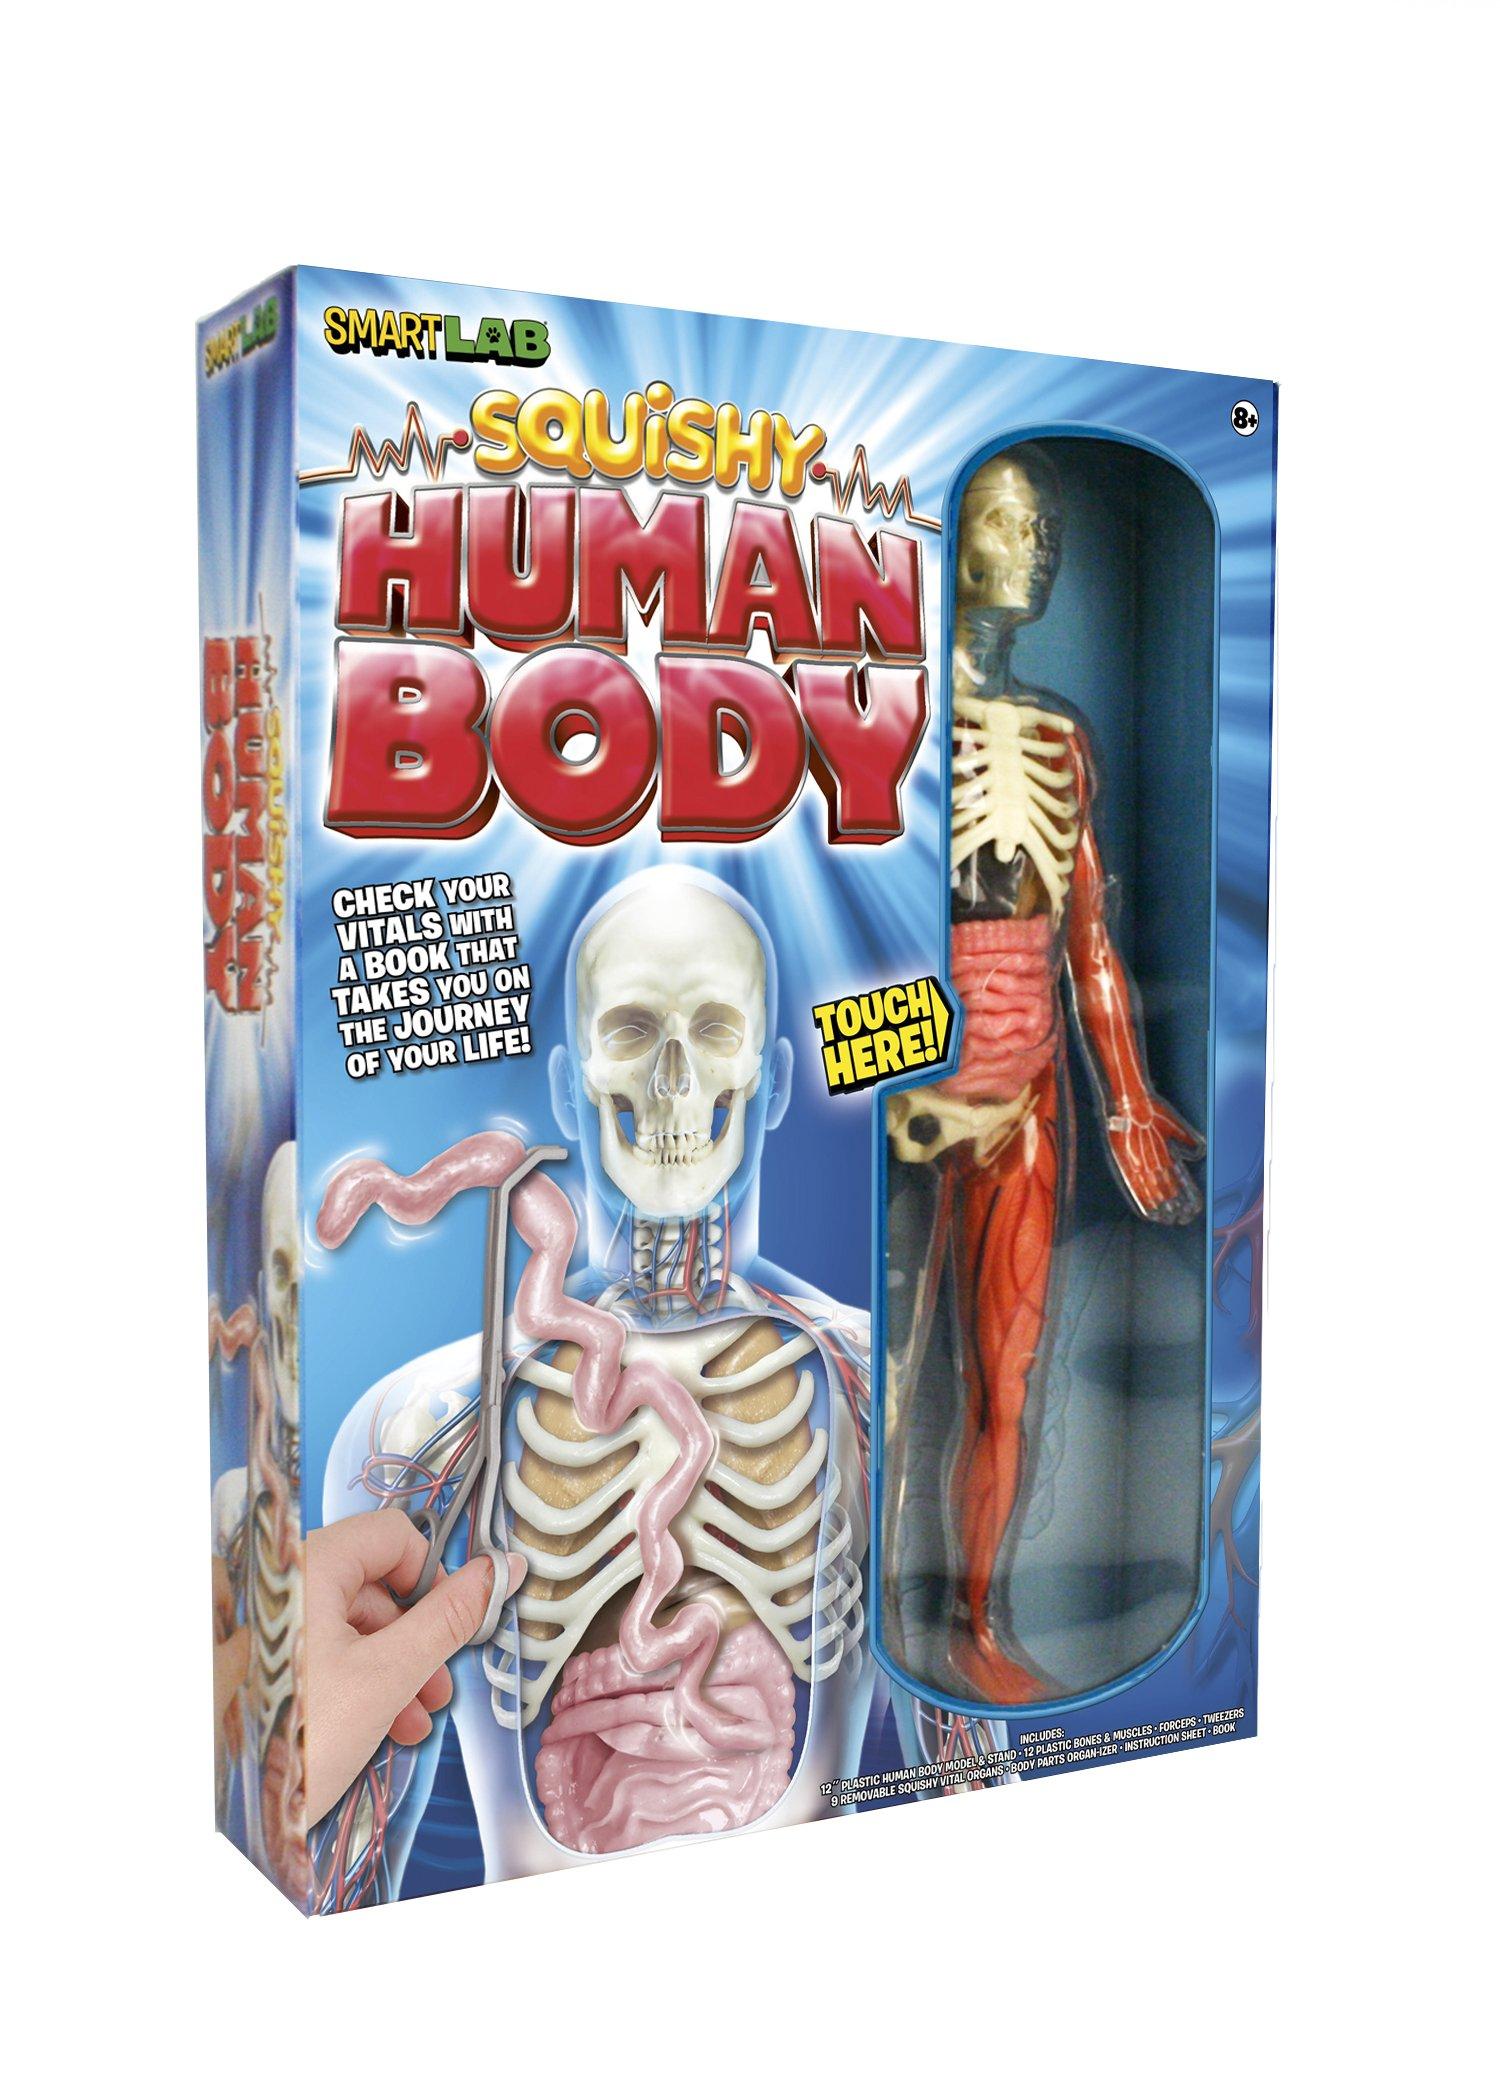 Squishy Human Body : SmartLab Toys Squishy Human Body Educational Science Kids Toy Anatomy Game New 1932855785 eBay